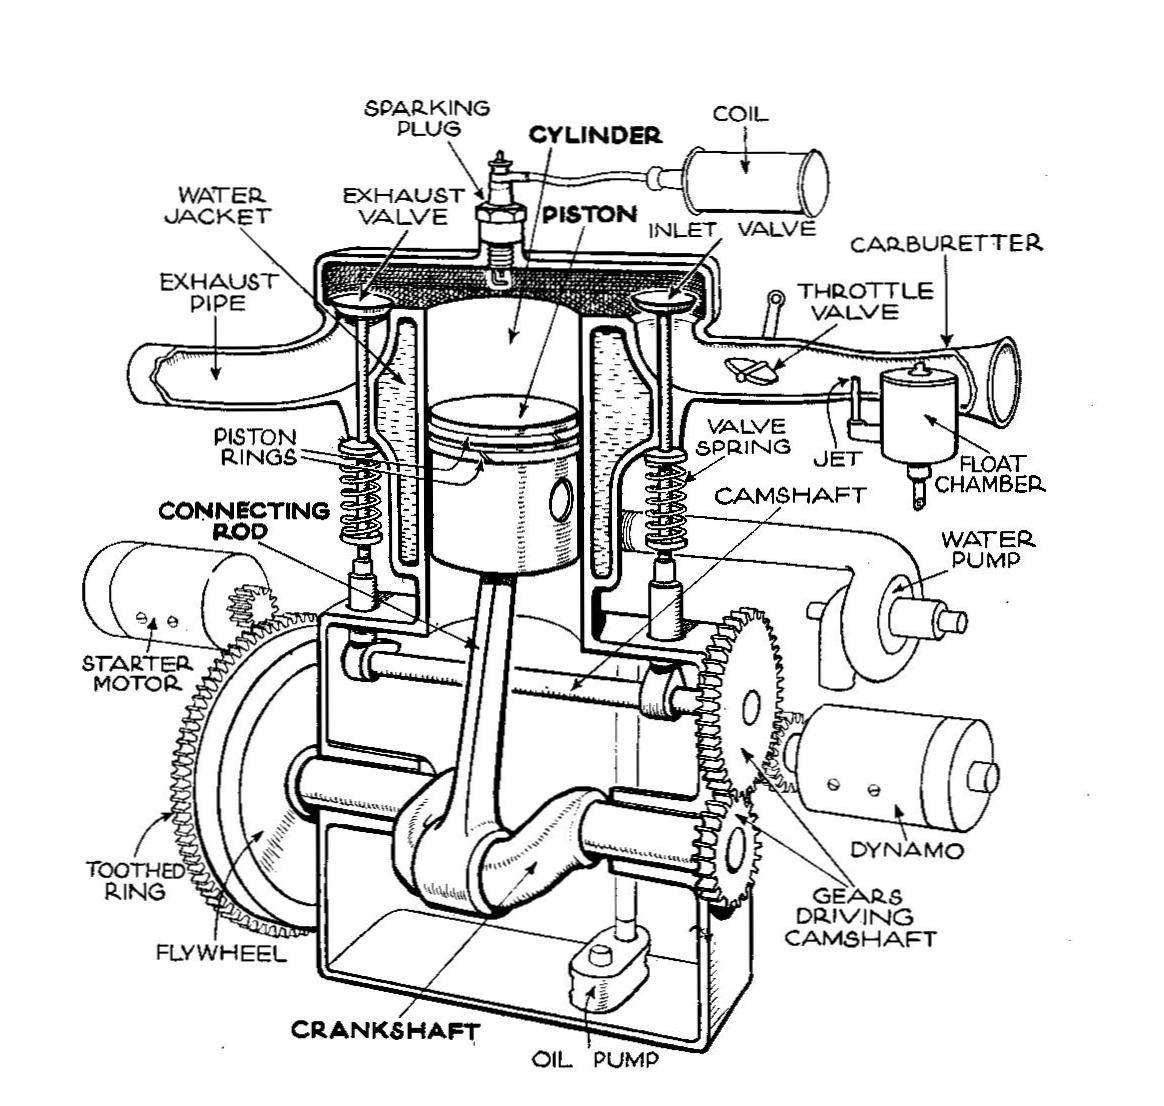 medium resolution of single cylinder t head engine autocar handbook 13th ed 1935 inline 6 cylinder diagram engine cylinder diagram